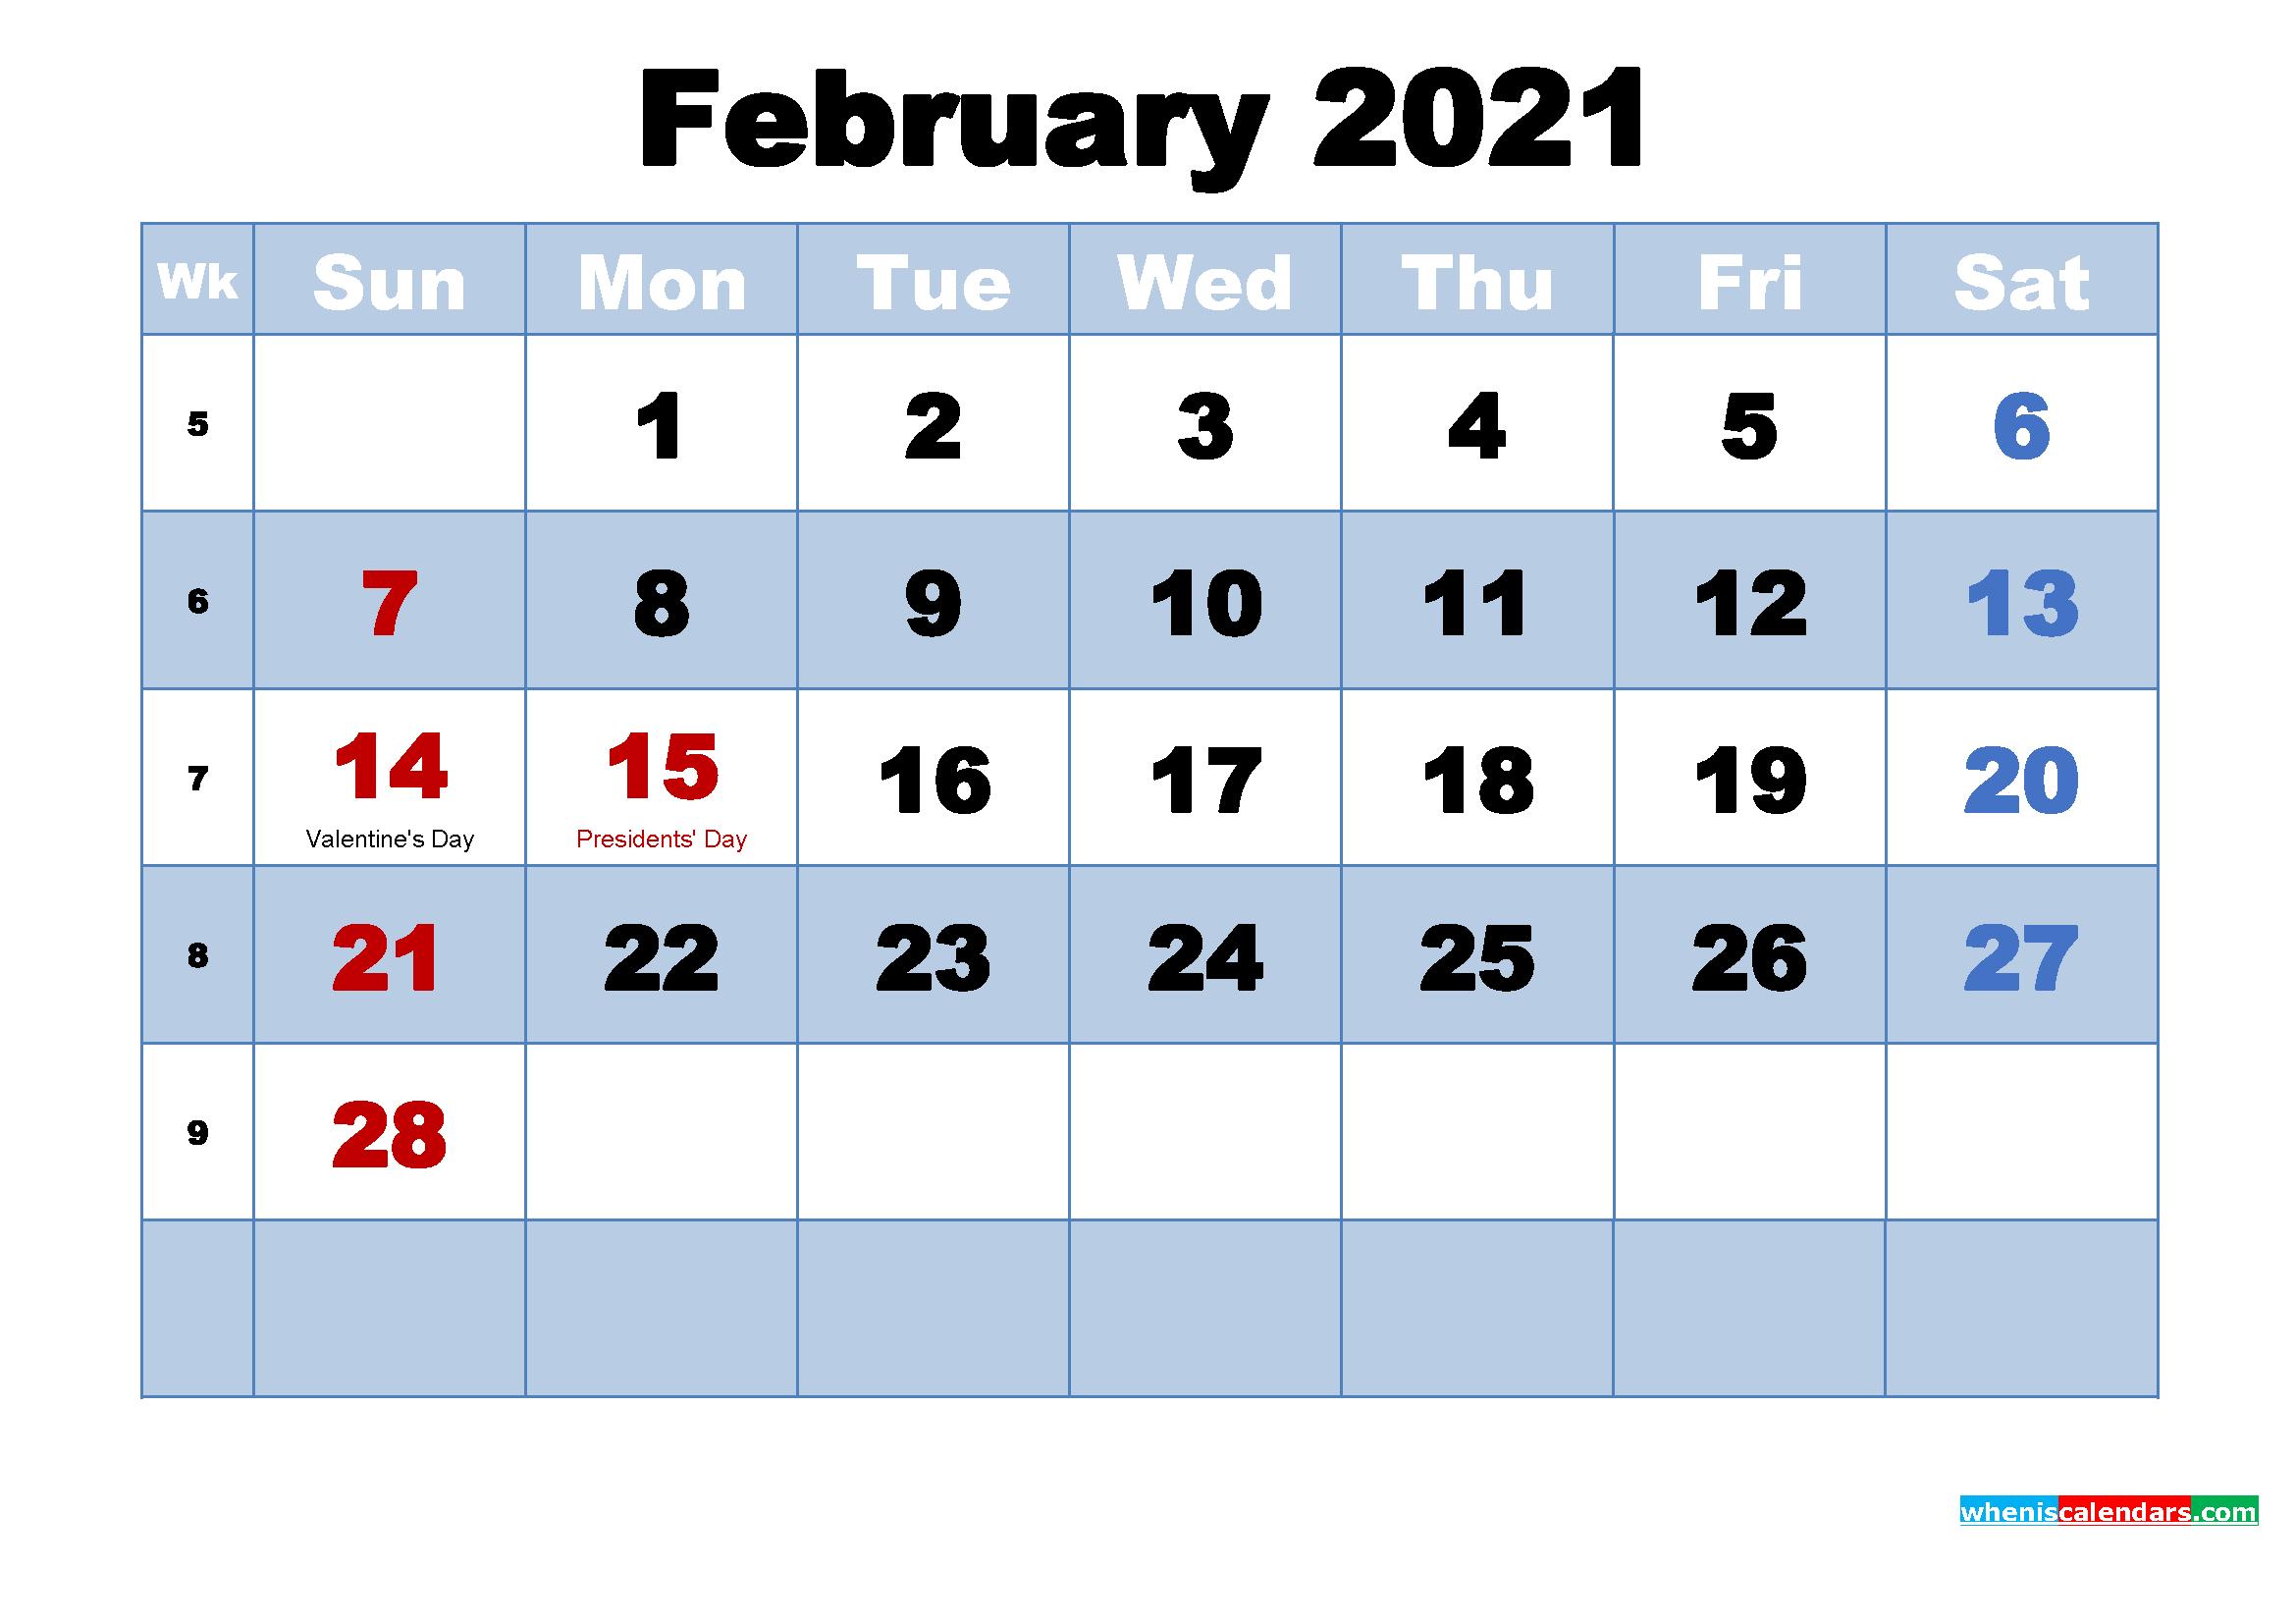 February 2021 Calendar Wallpapers Top Free February 2021 Calendar Backgrounds Wallpaperaccess